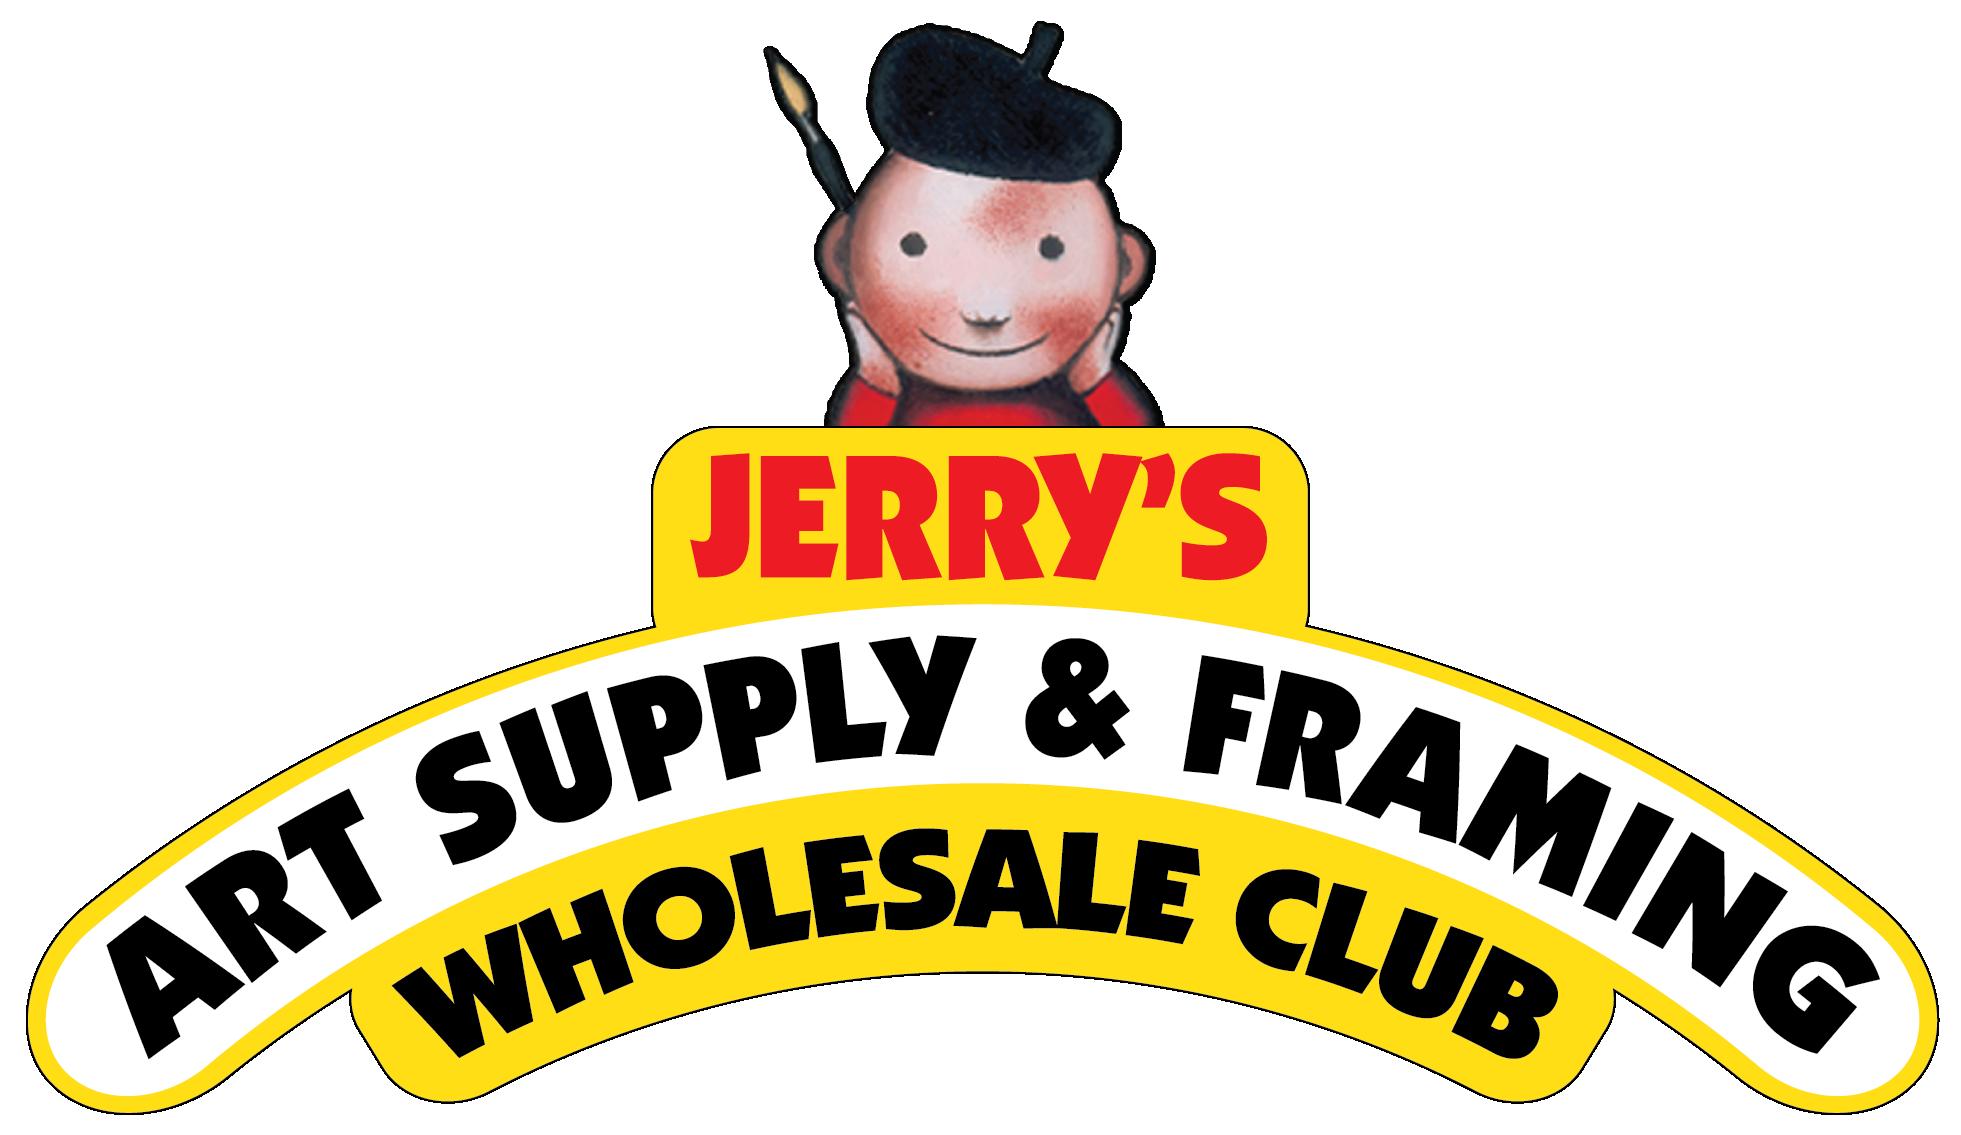 Jerry's Art Supply & Framing Wholesale Club – Miami